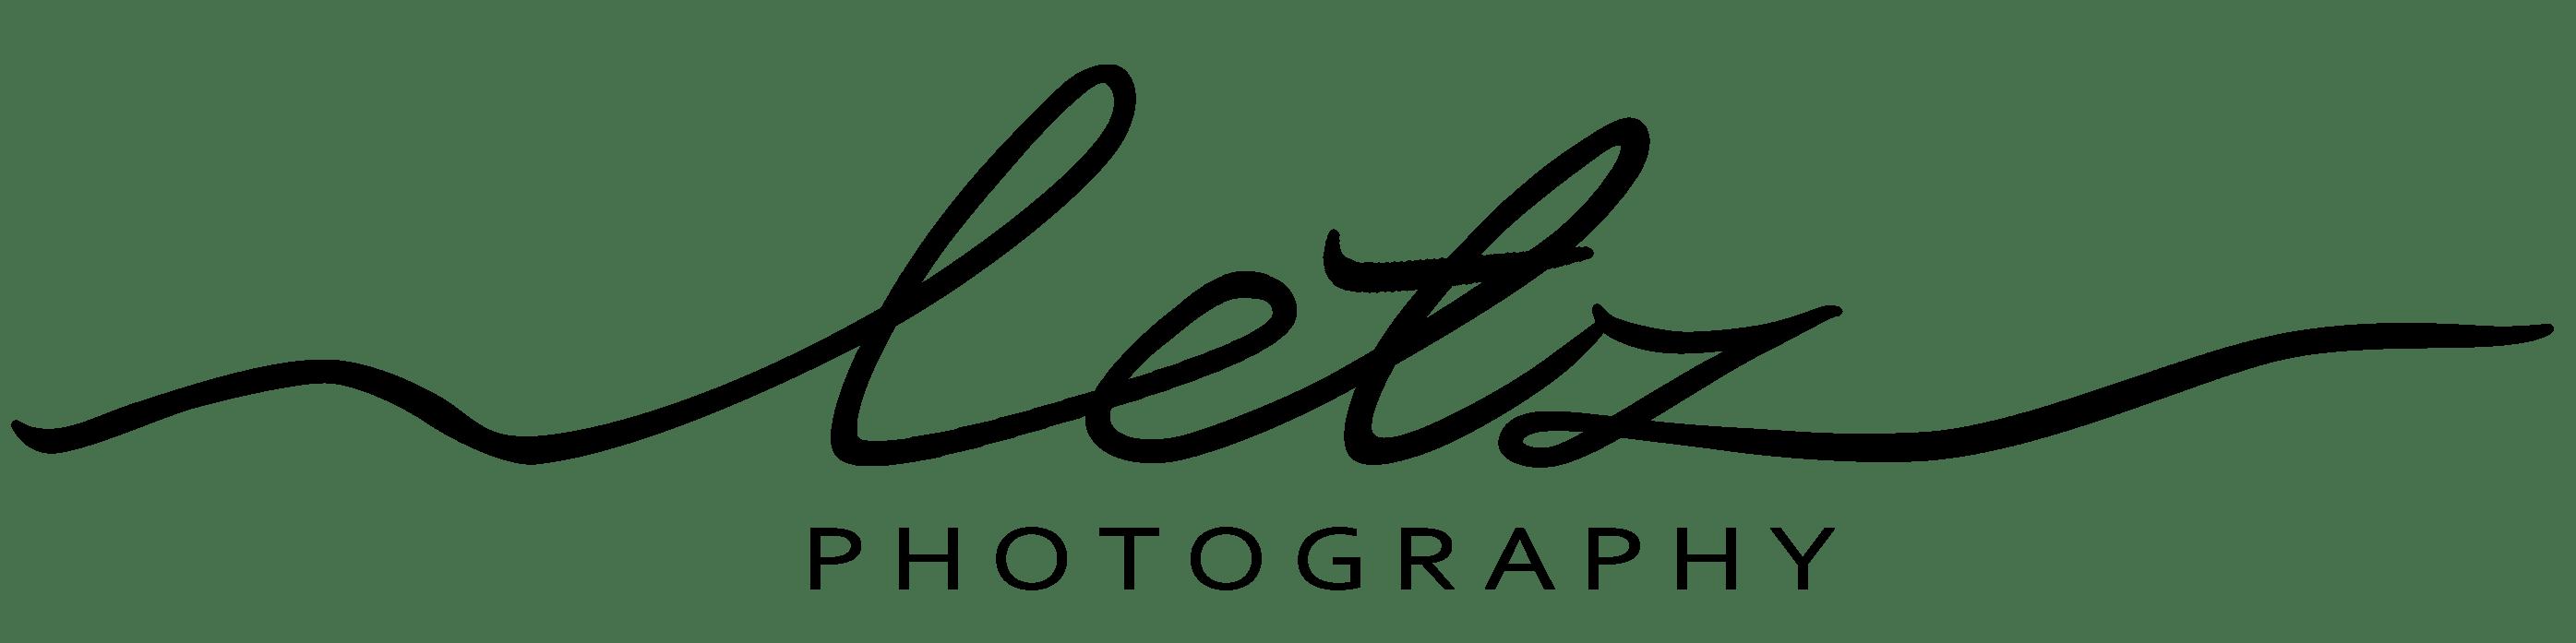 LETZ photo巴黎婚纱写真摄影